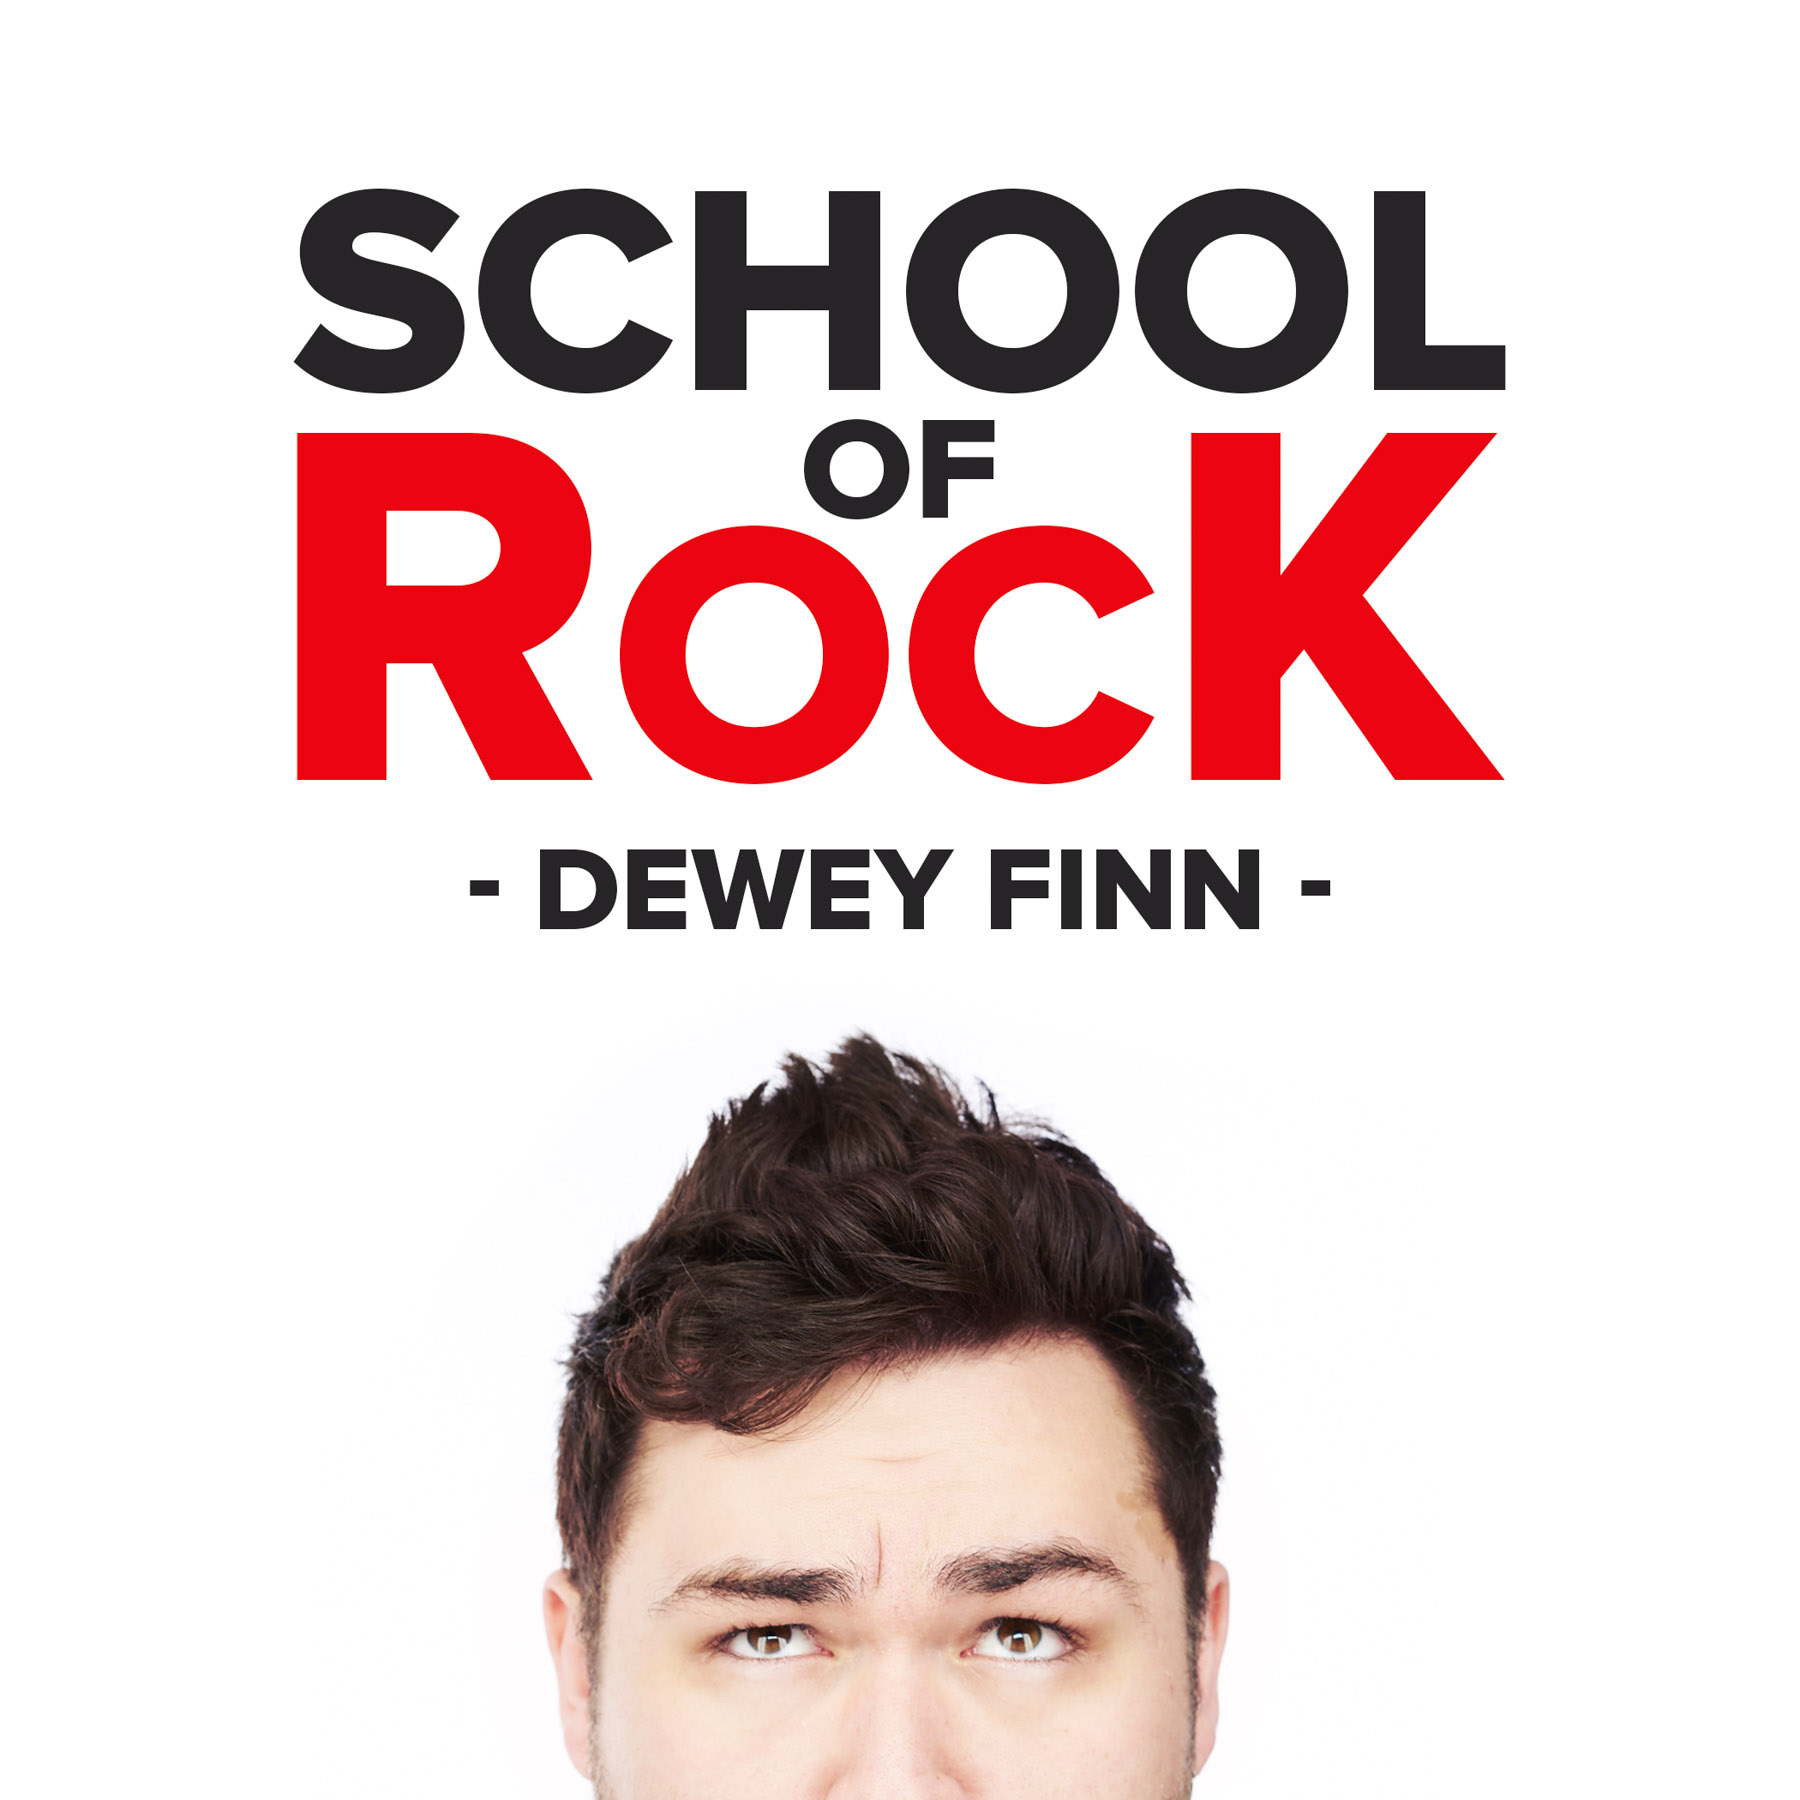 Jonathan McInnis as Dewey Finn in School of Rock at The Acting Studio - Personal Promo Shot